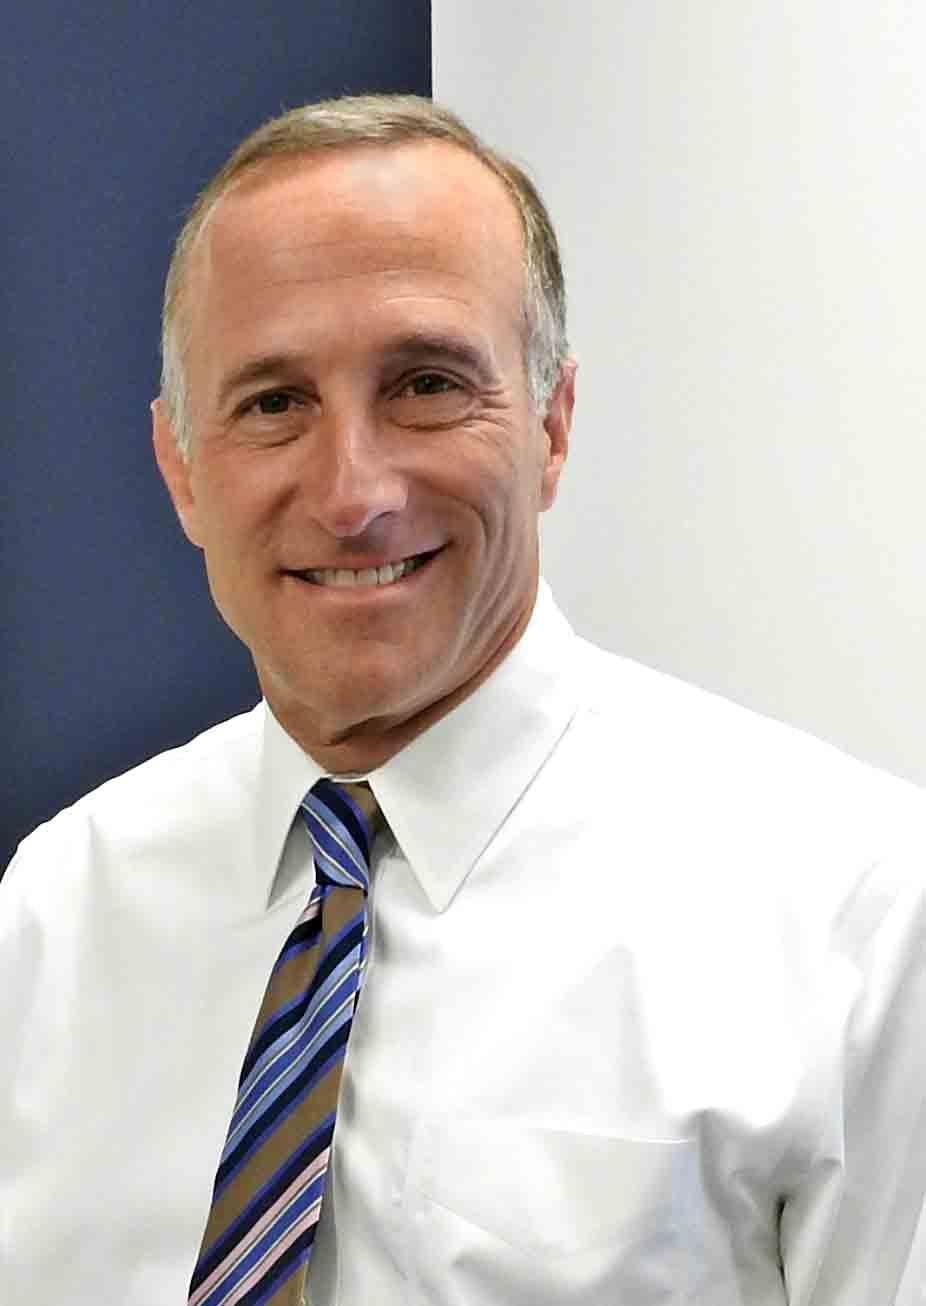 Headshot of Dan Schimberg, Uptown Rental Properties President/Founder.